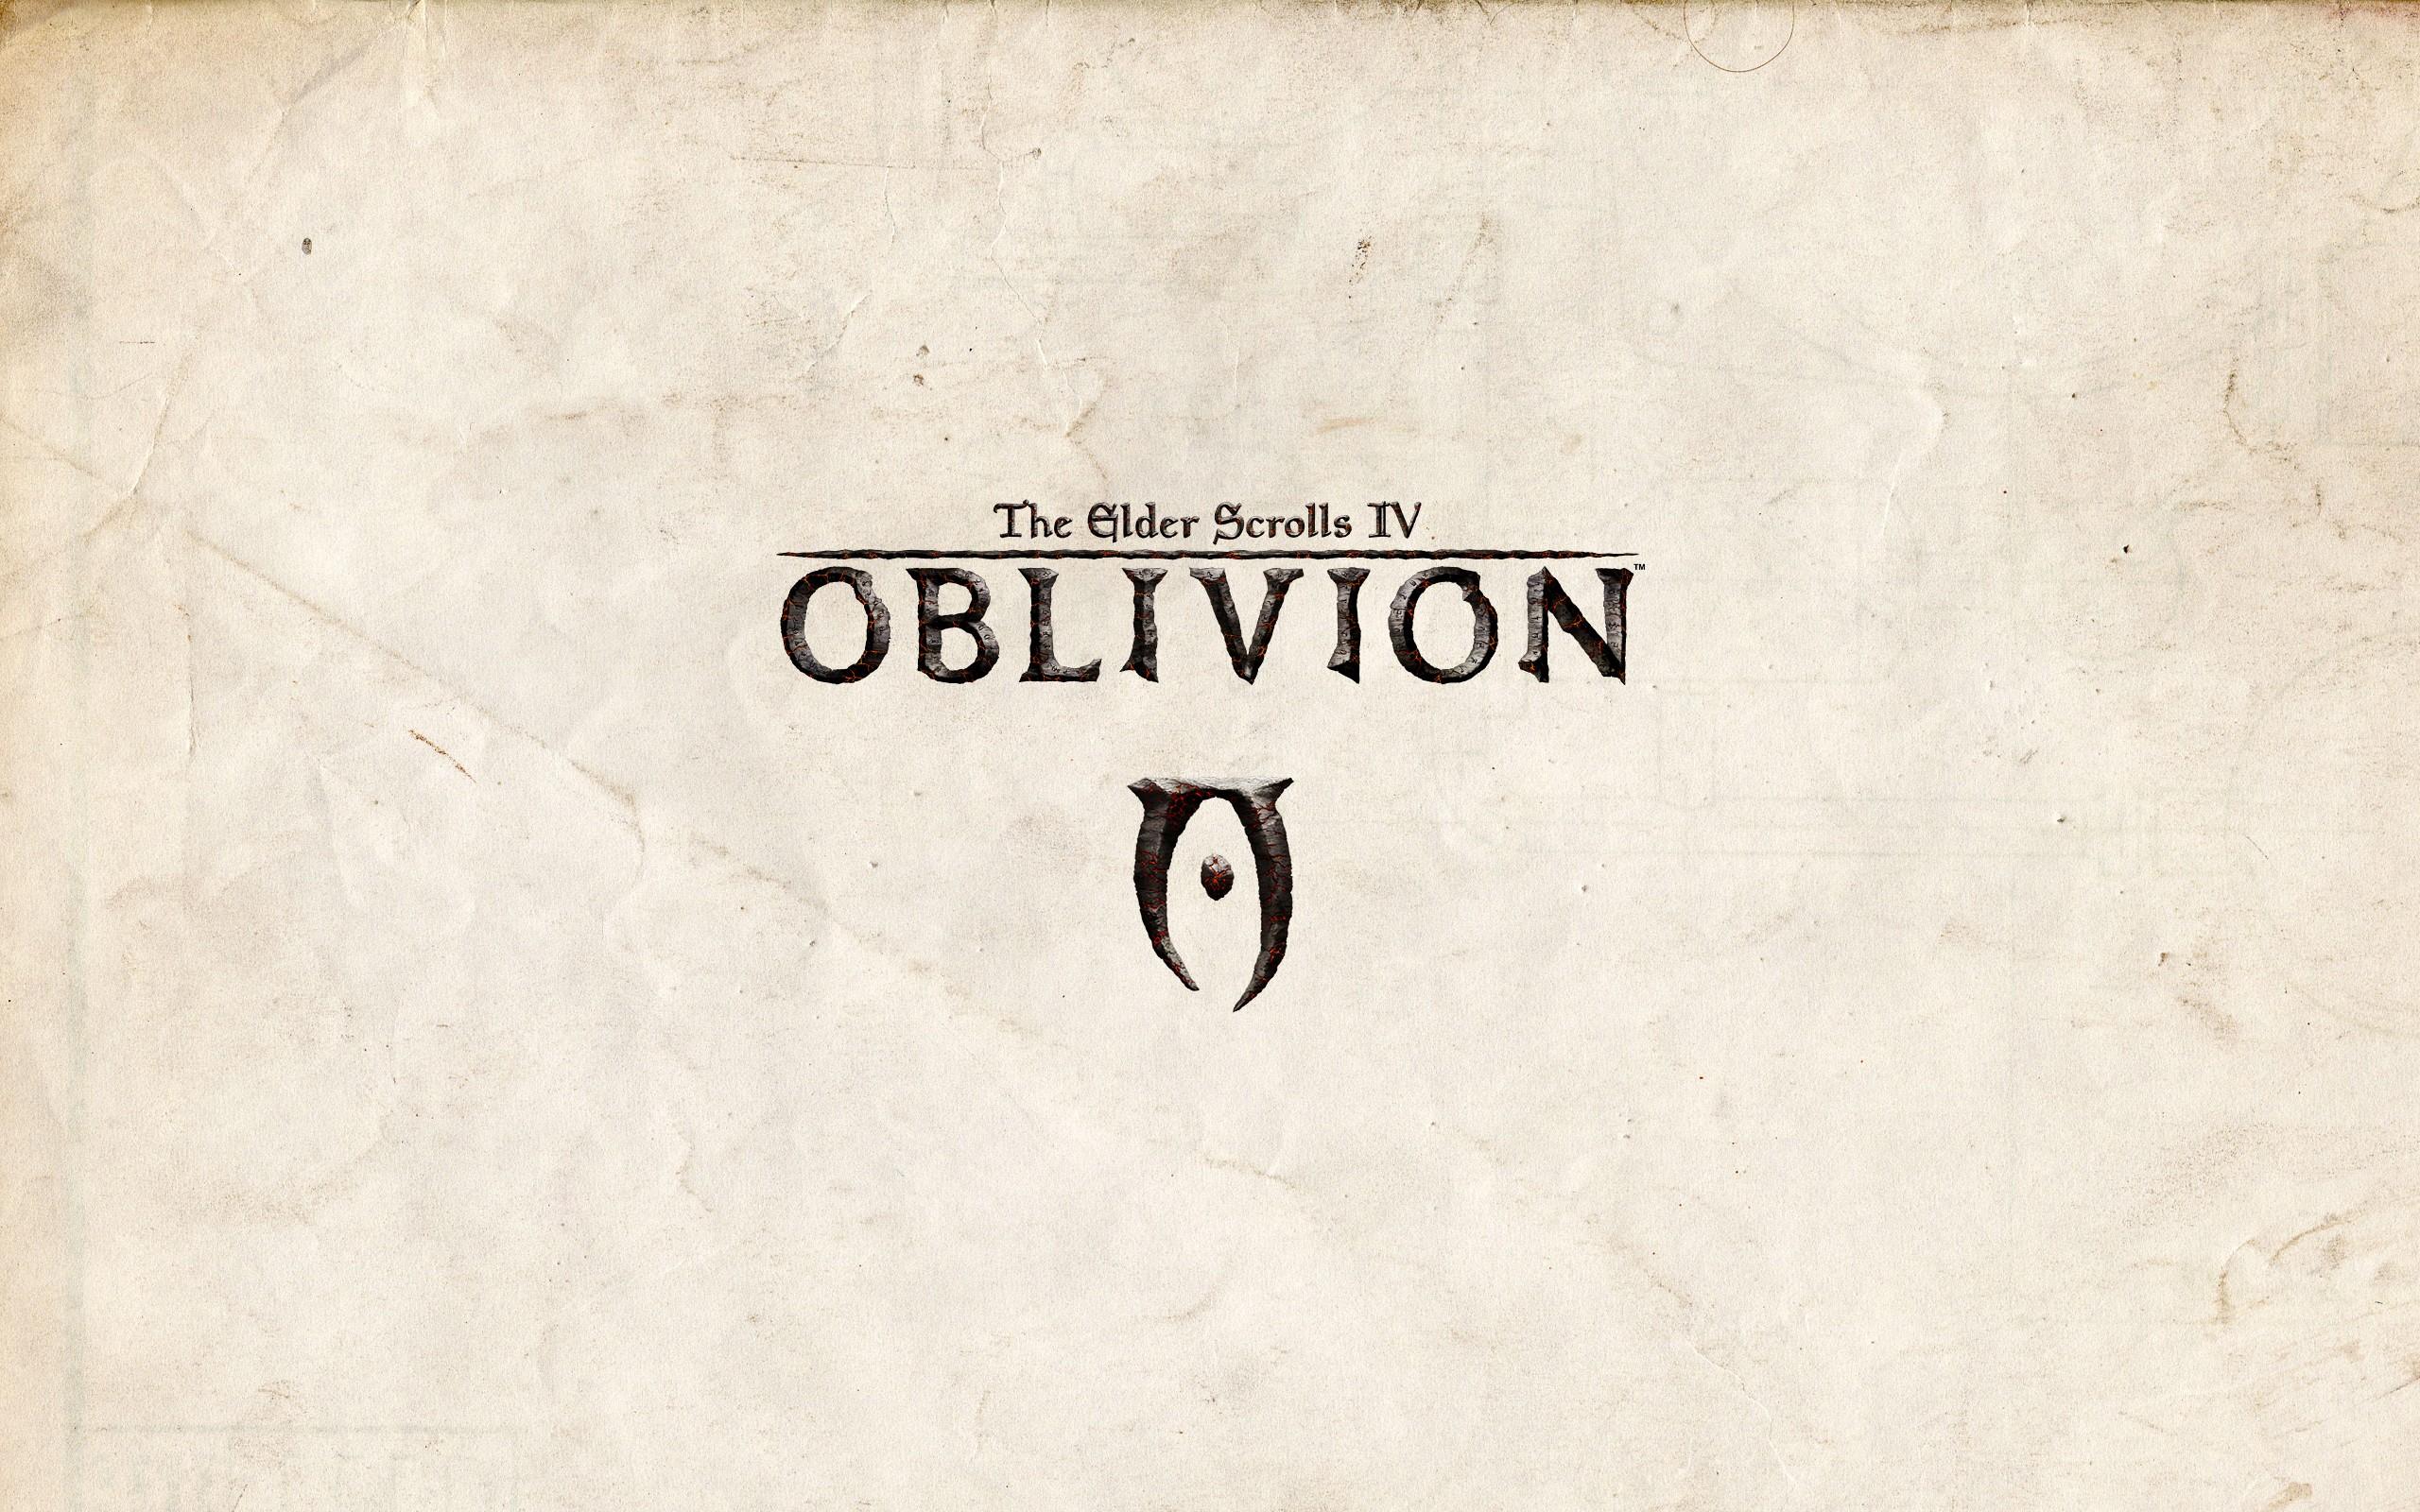 The Elder Scrolls The Elder Scrolls Iv Oblivion Iv Wallpaper